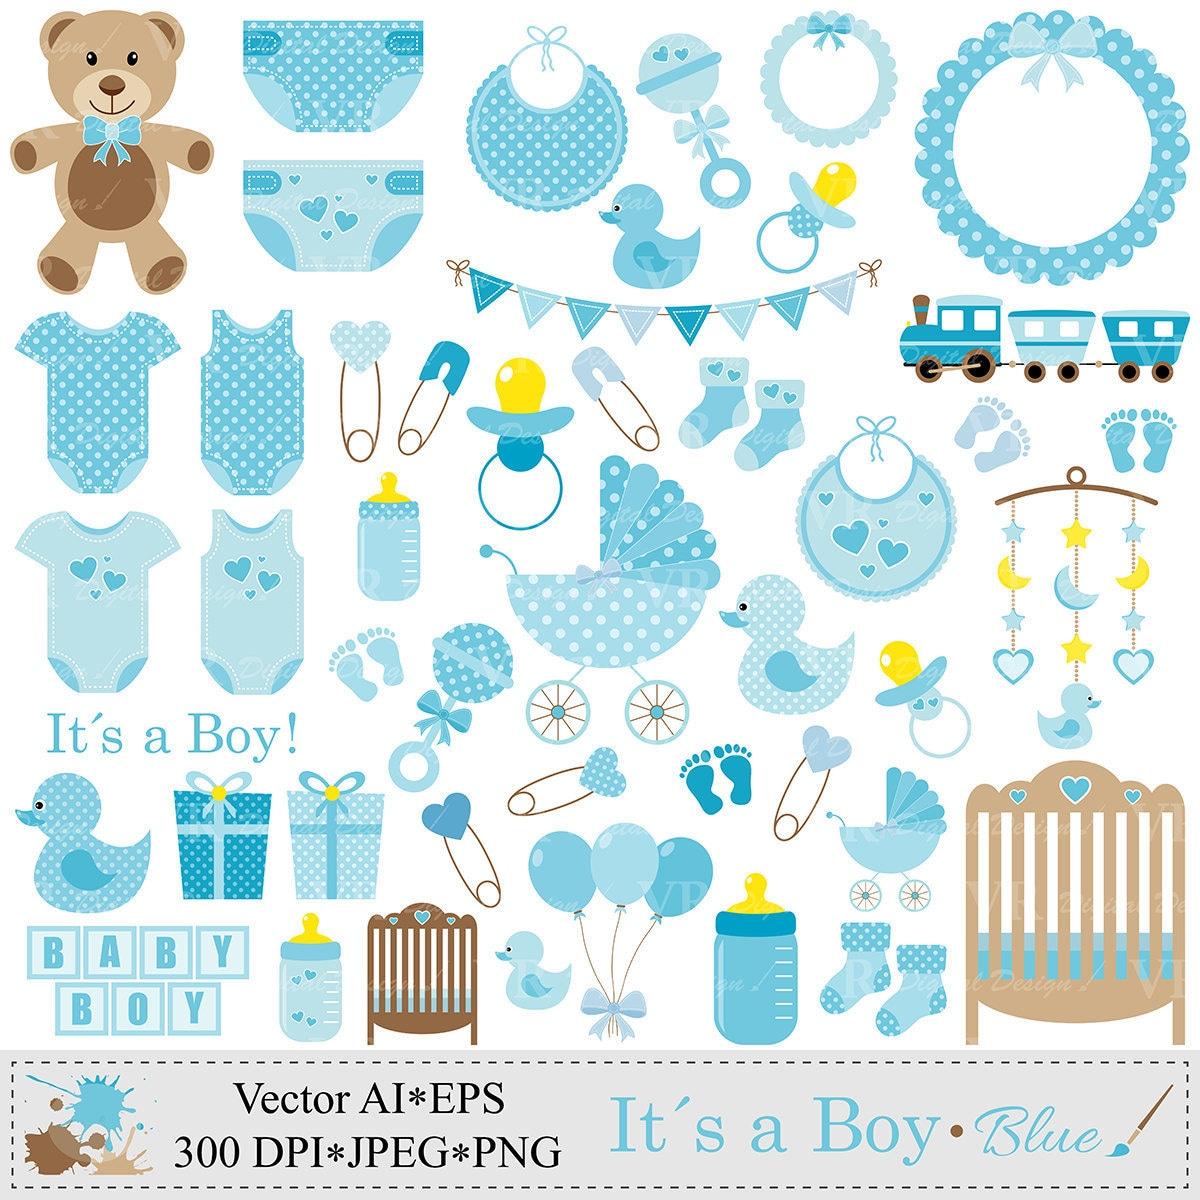 baby boy clip art blue baby shower clipart nursery clip art rh etsy com Baby Boy Shower Borders Clip Art Baby Boy Shower Borders